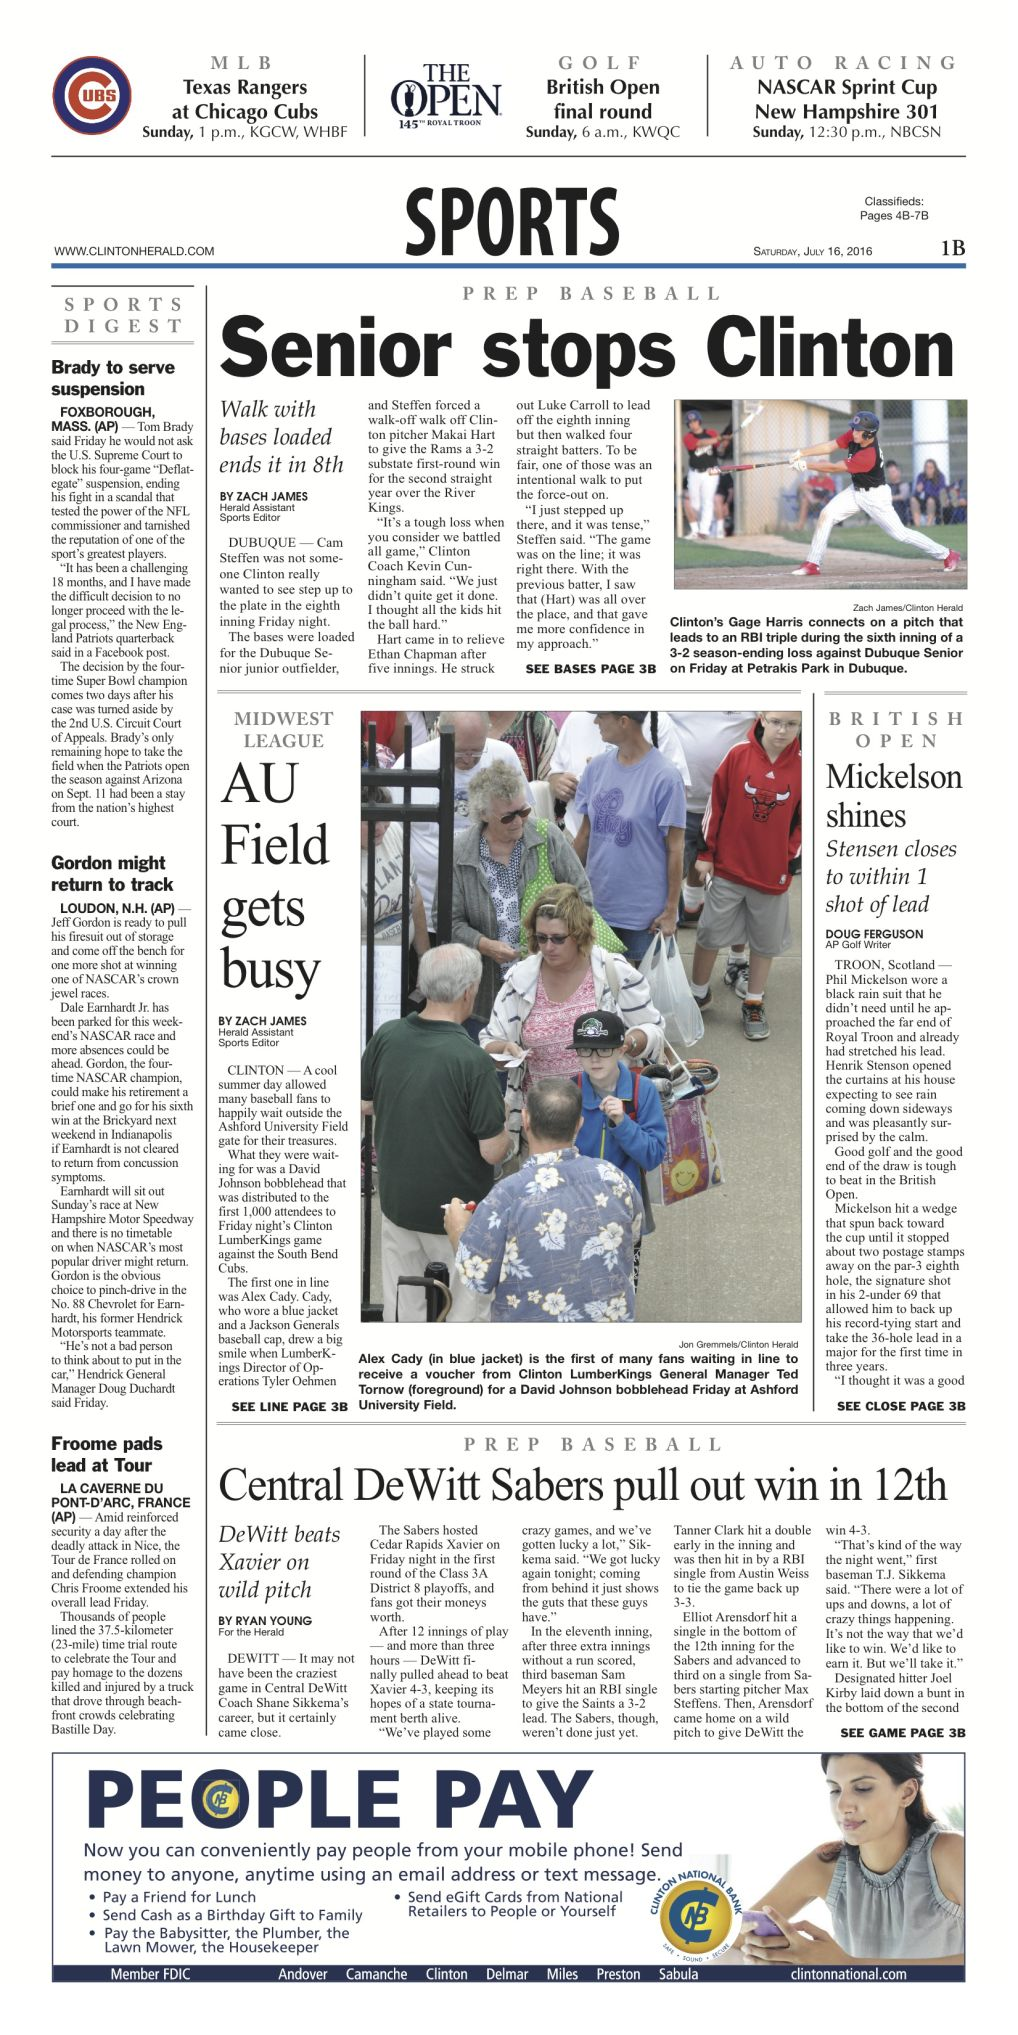 Prep baseball: Senior stops Clinton     again | Sports